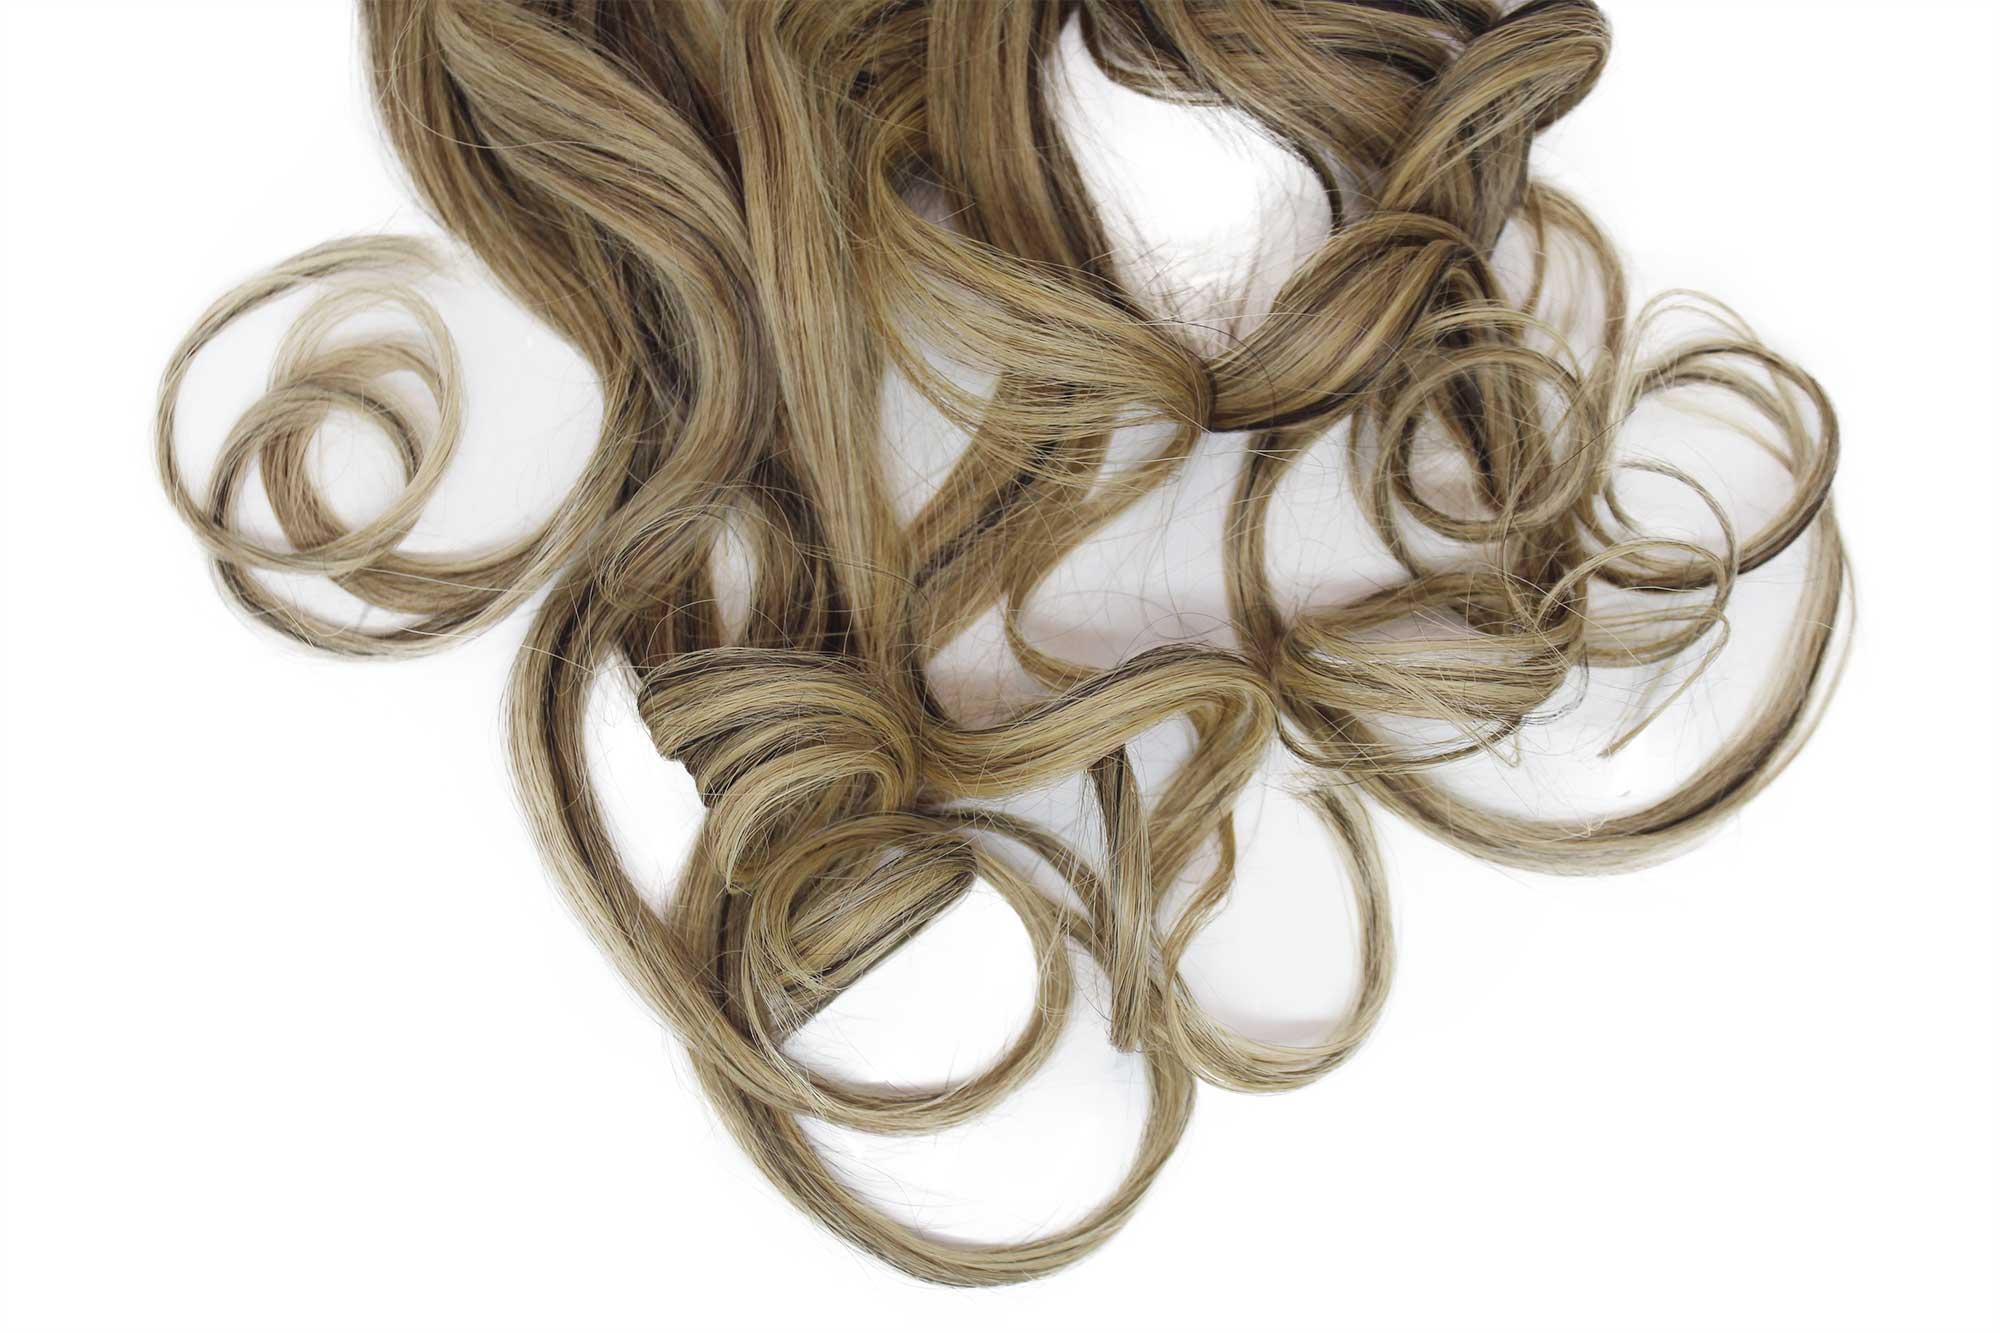 Aplique Tic Tac Ombré Hair 80g Cabelos Humanos Naturais